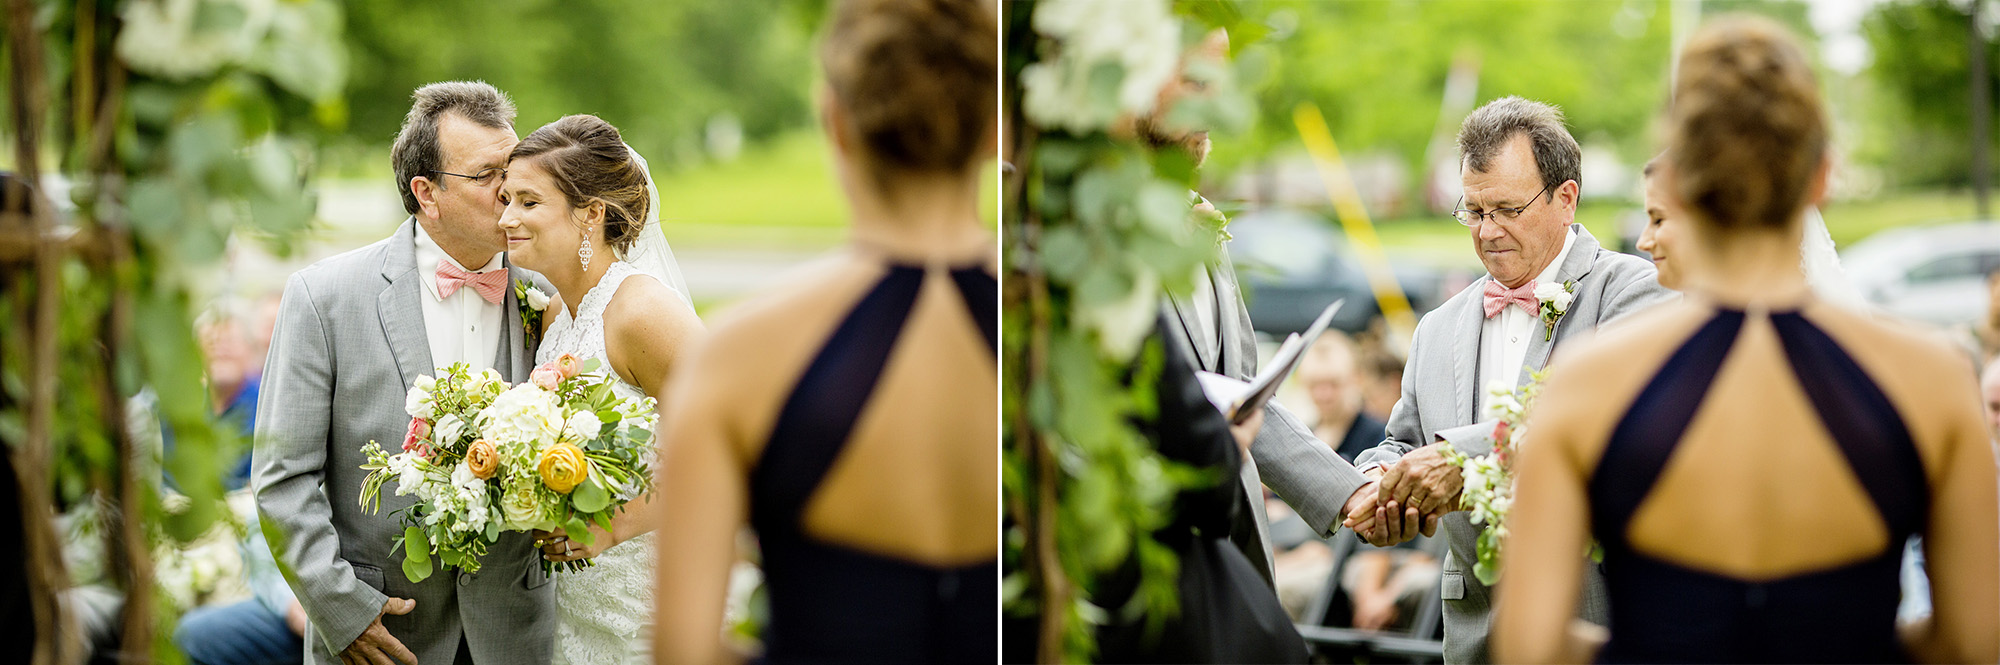 Seriously_Sabrina_Photography_Lexington_Kentucky_Round_Barn_Red_Mile_Stable_of_Memories_Wedding_Hart_69.jpg